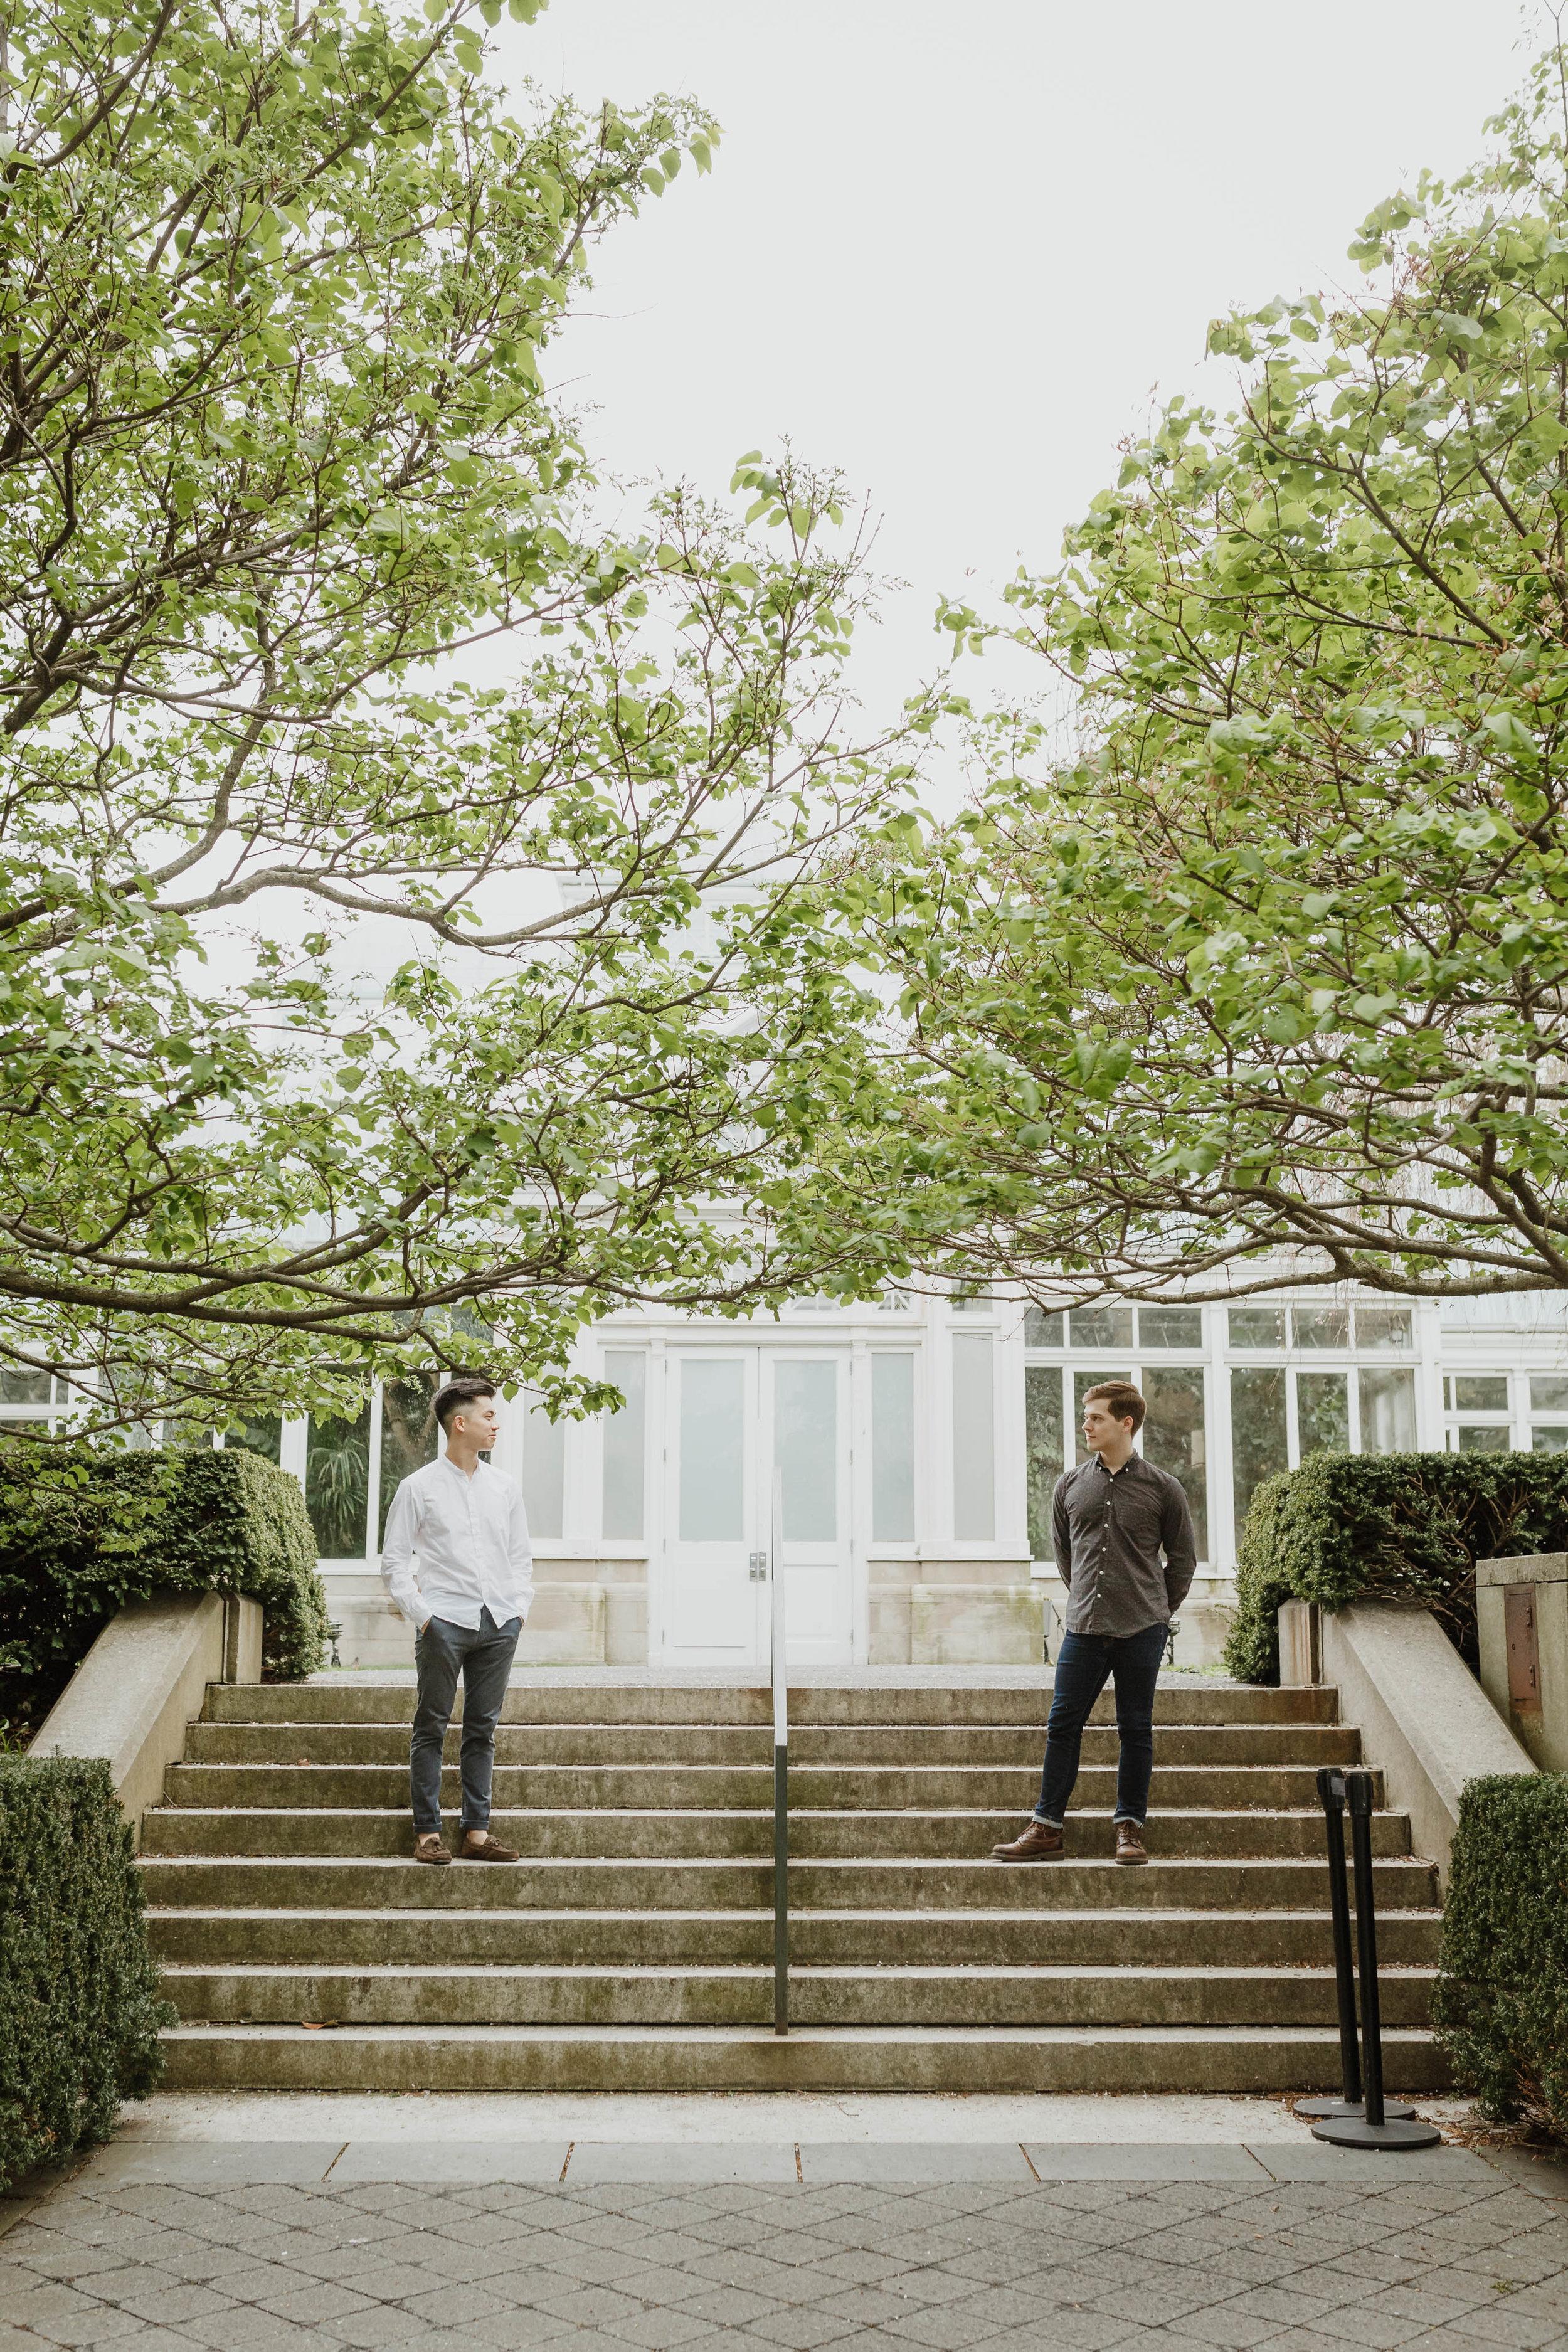 new-york-botanical-garden-same-sex-engagement-4.jpg